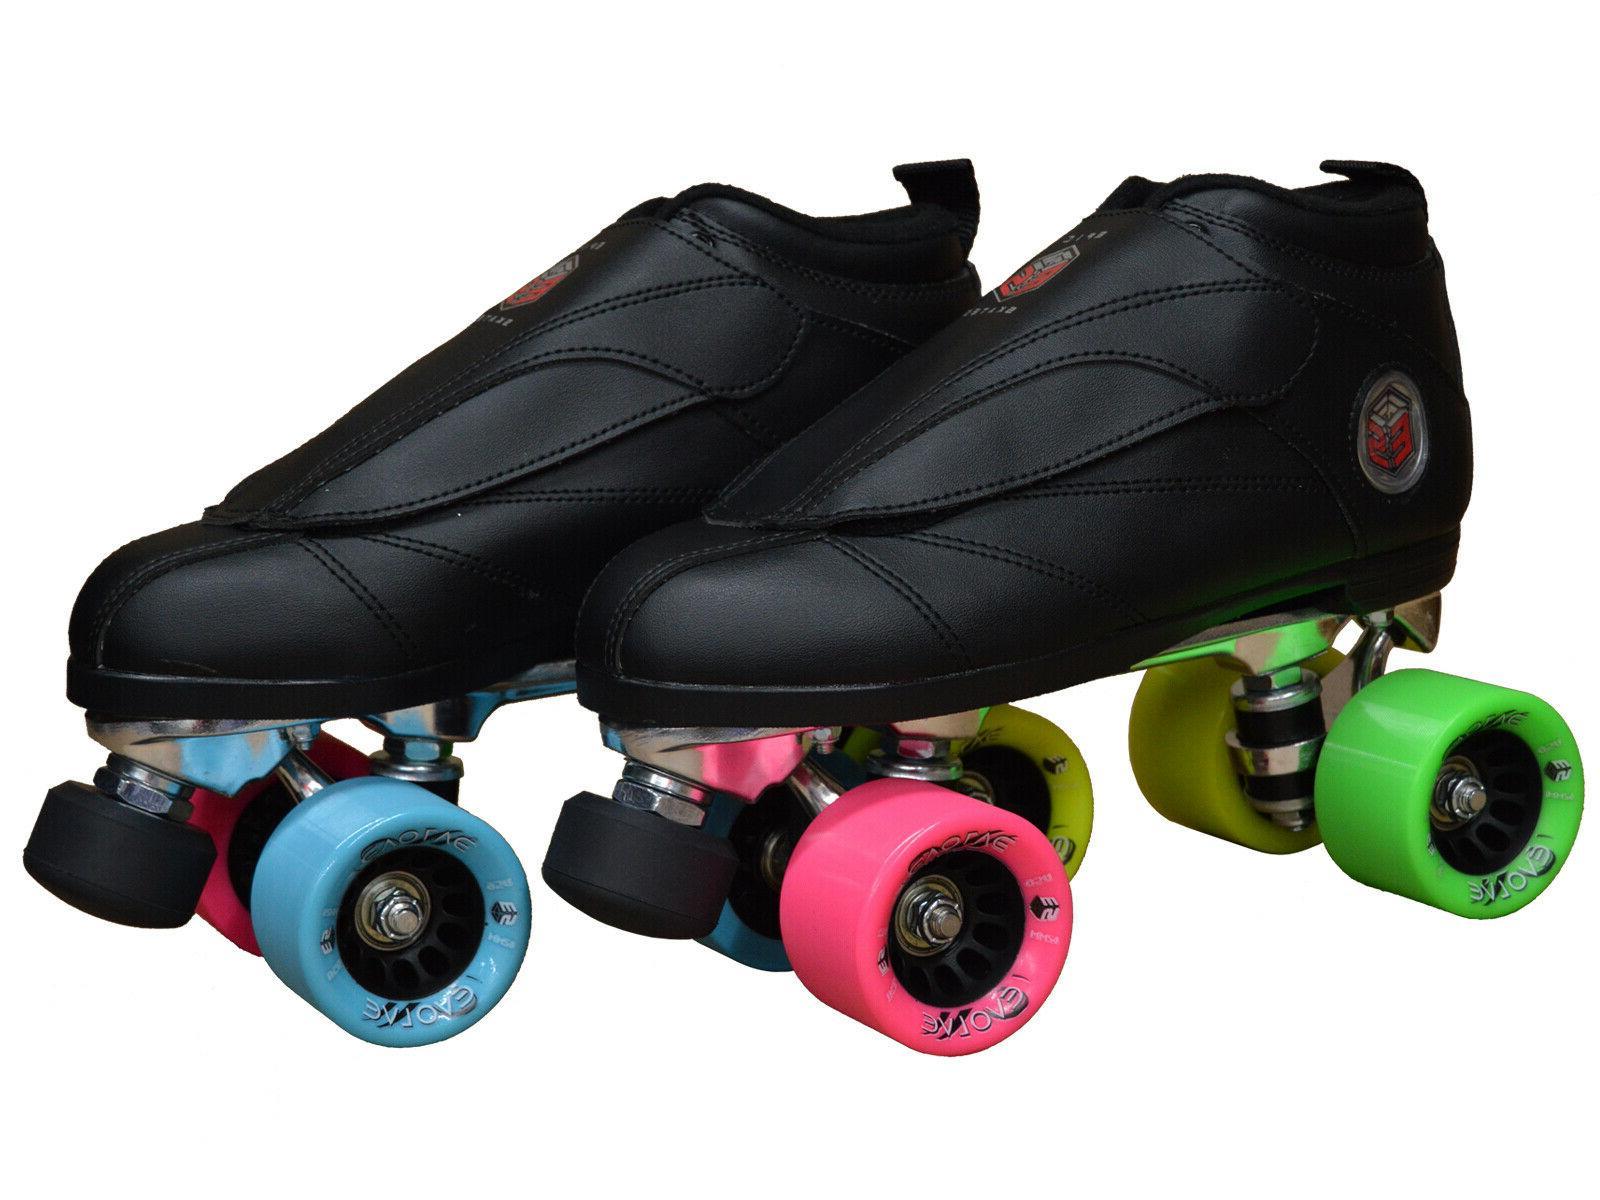 New! & Rainbow Epic Roller